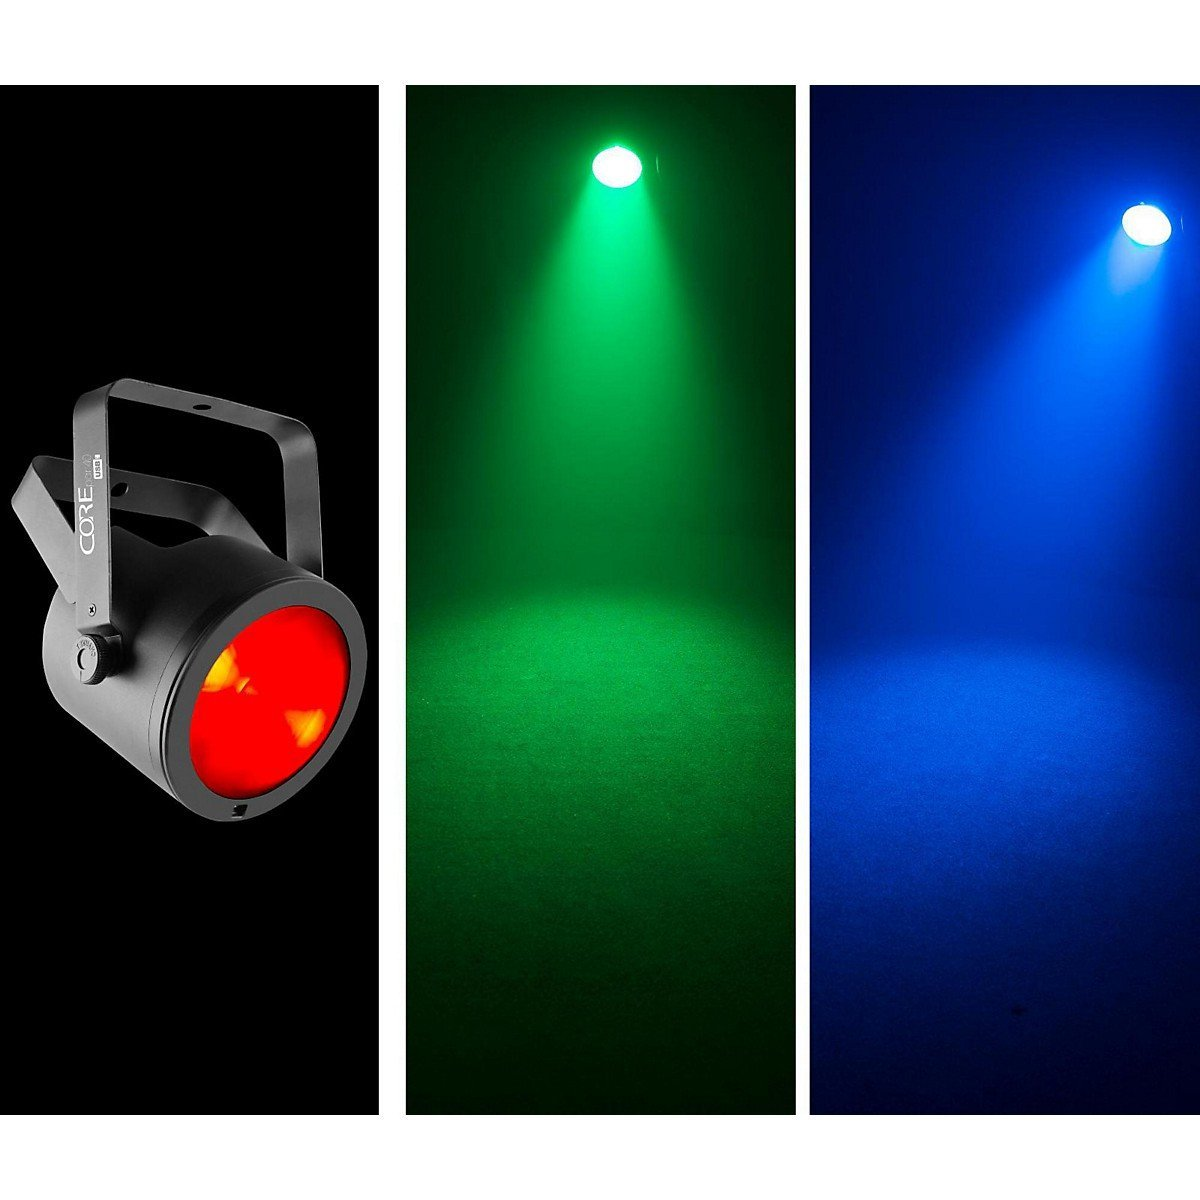 CHAUVET DJ COREpar 40 USB LED Washlight w/Chip-on-Board & D-Fi USM Compatibility by CHAUVET DJ